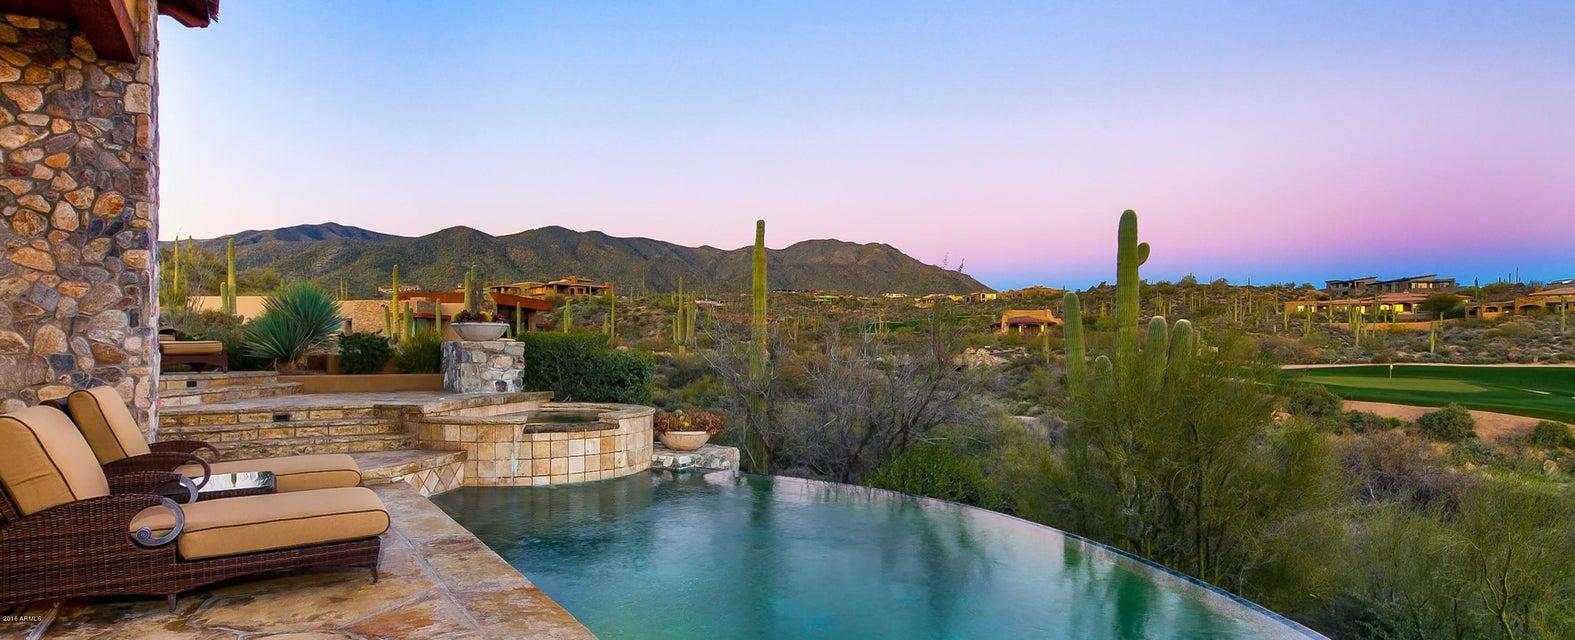 MLS 5686341 41445 N 95TH Street, Scottsdale, AZ Desert Mountain in Scottsdale